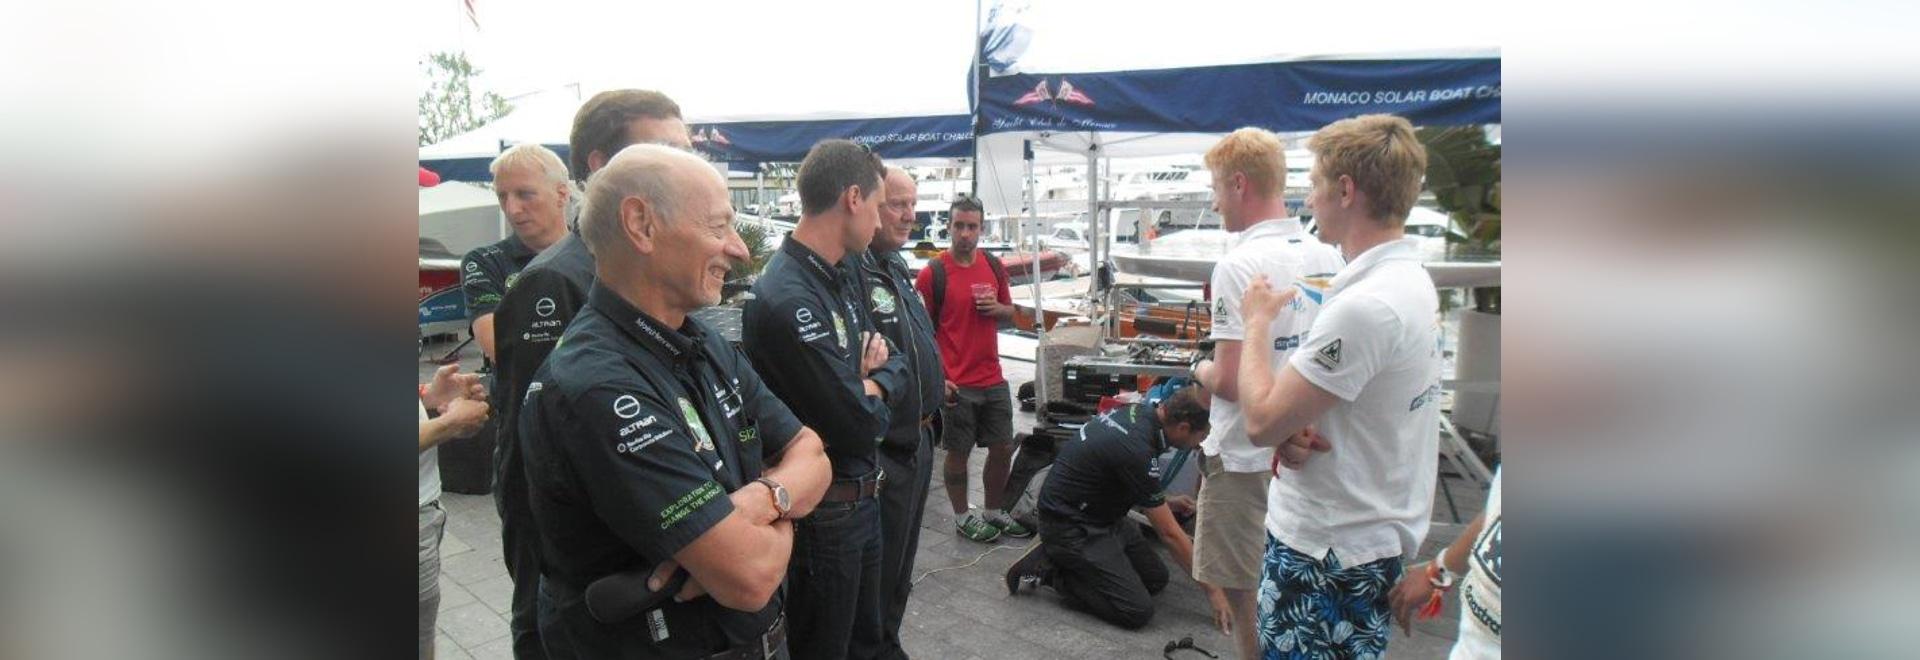 Members of the Solar Impulse Team and the Tu Delft Solar Boat Team